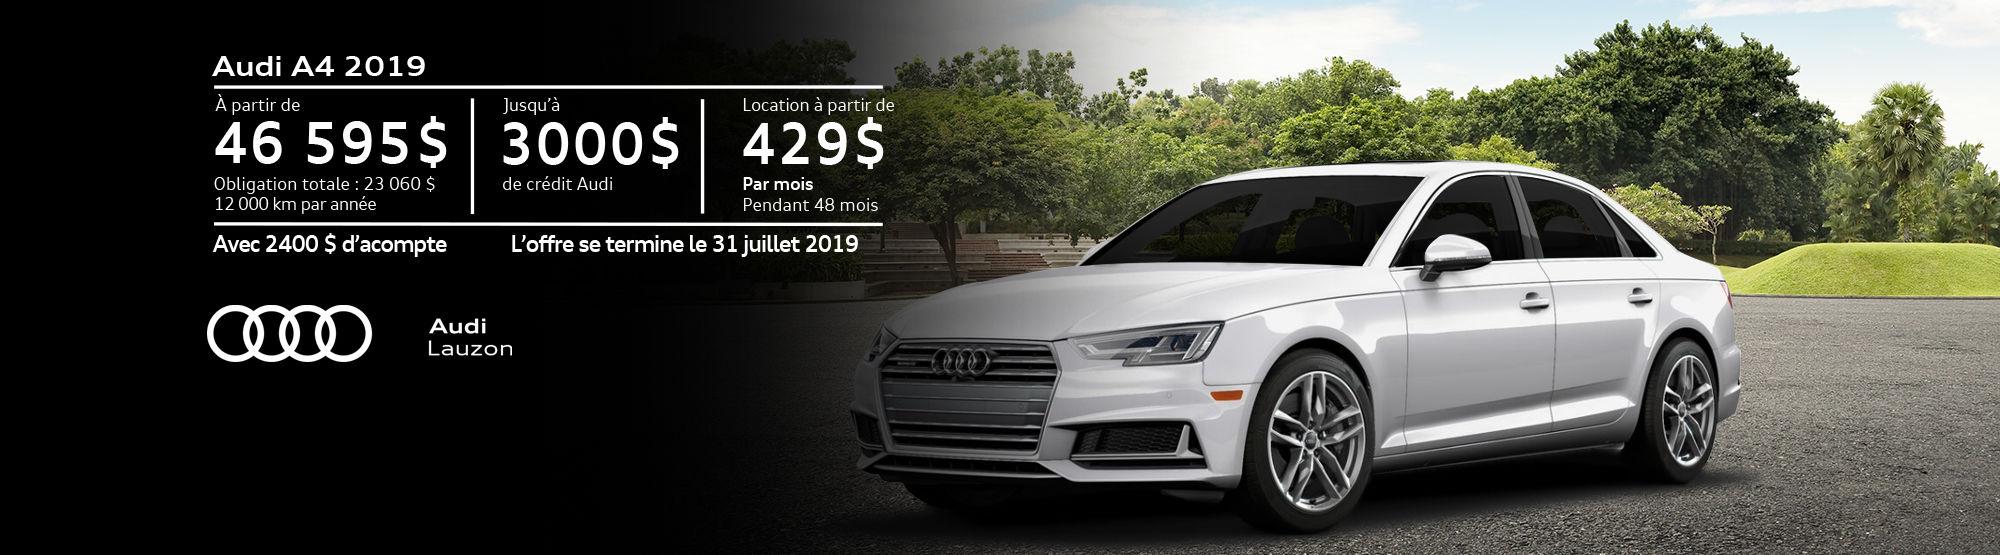 Audi A4 juillet 2019